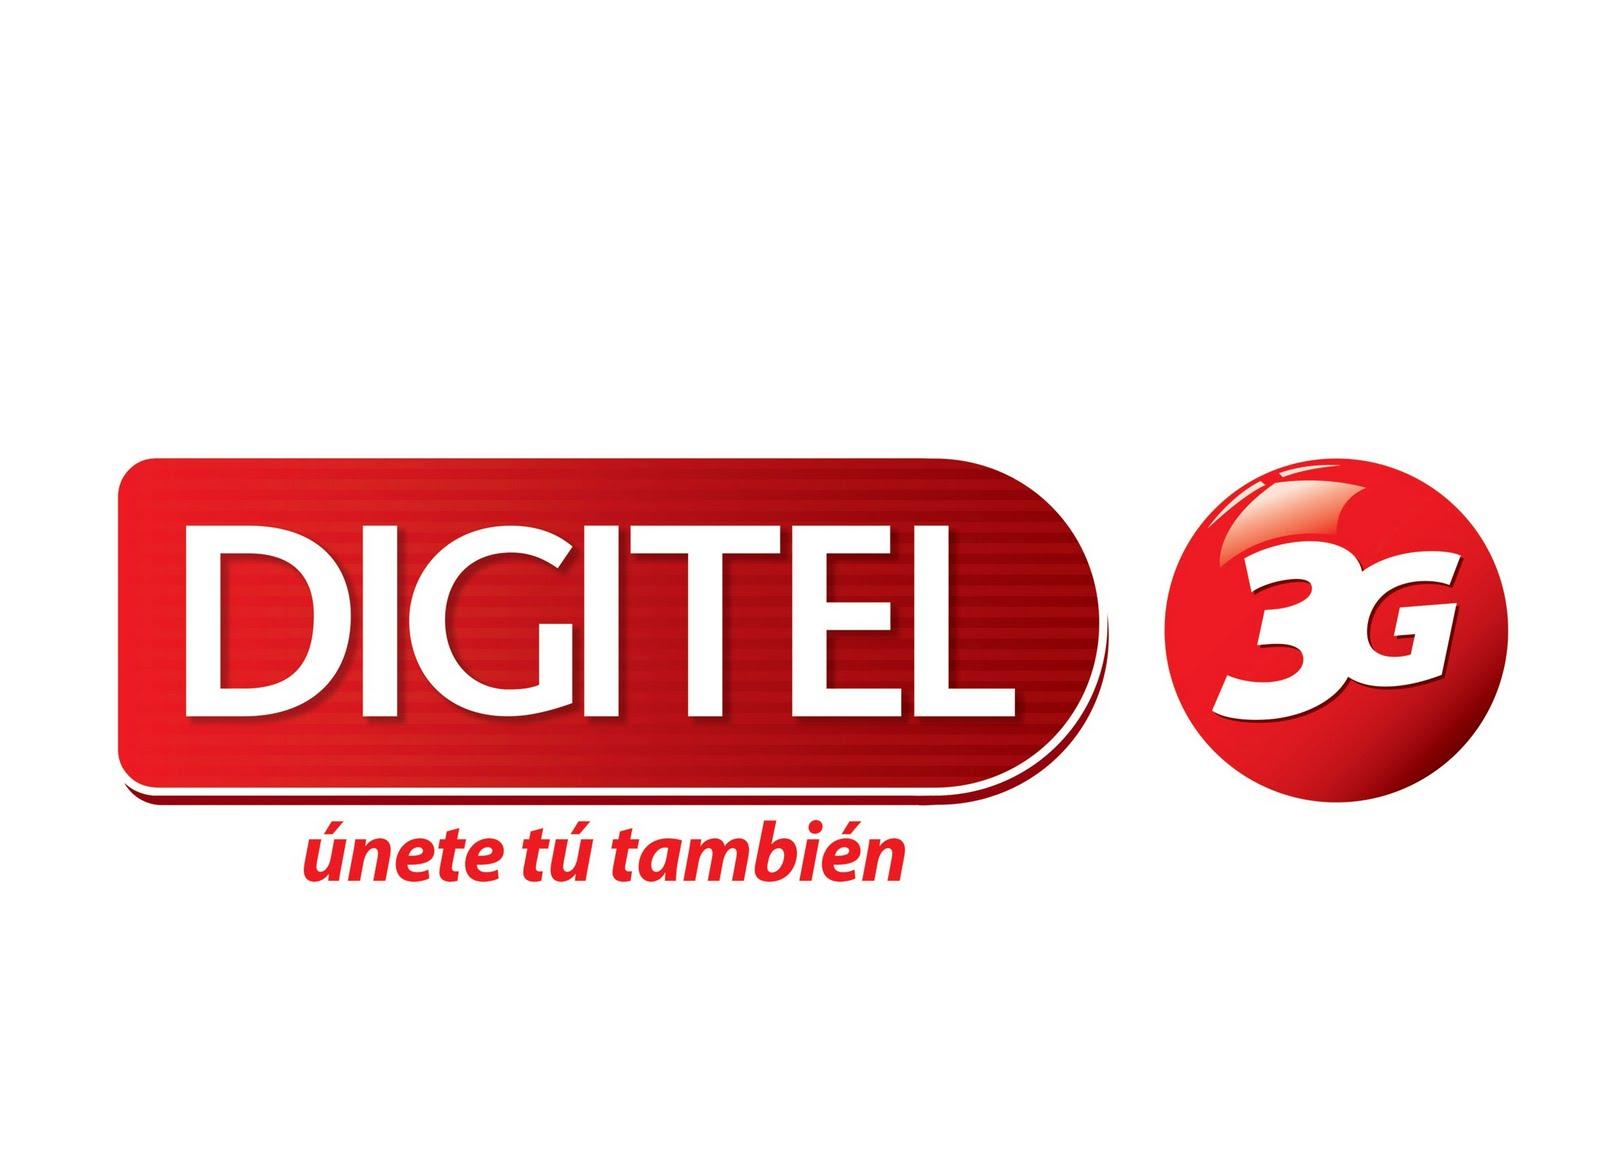 DIGITEL